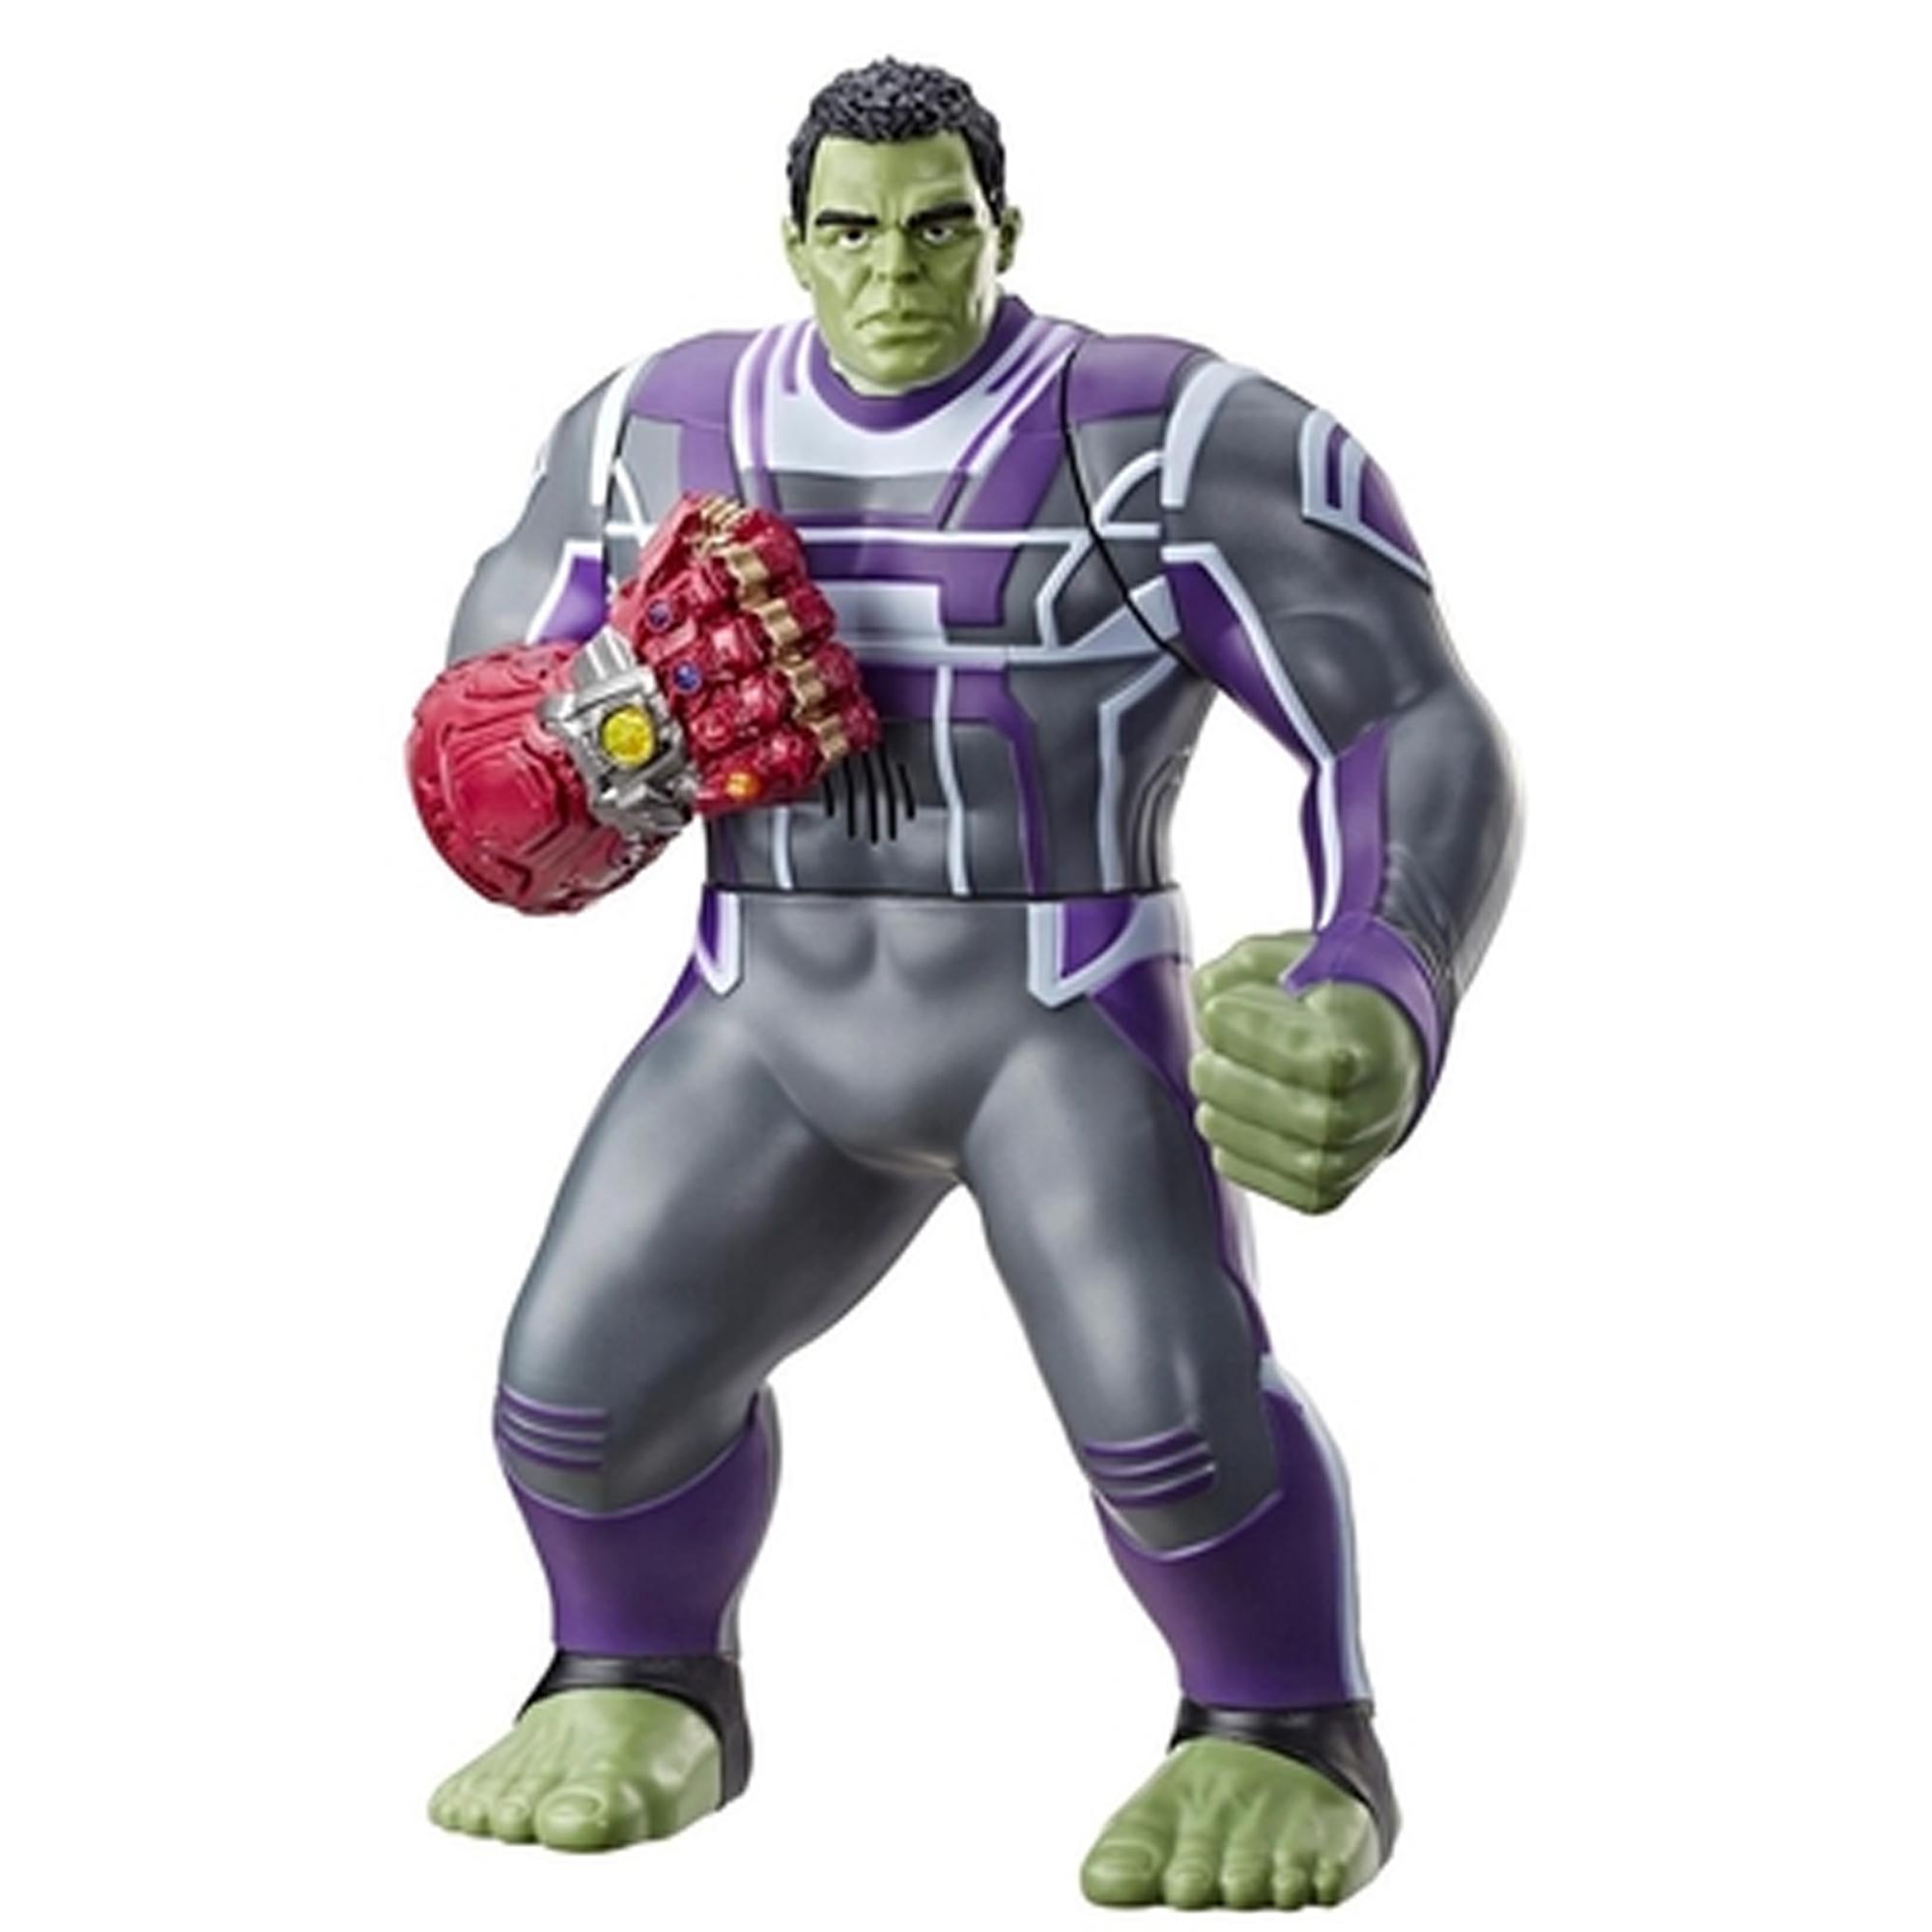 Power Punch Hulk